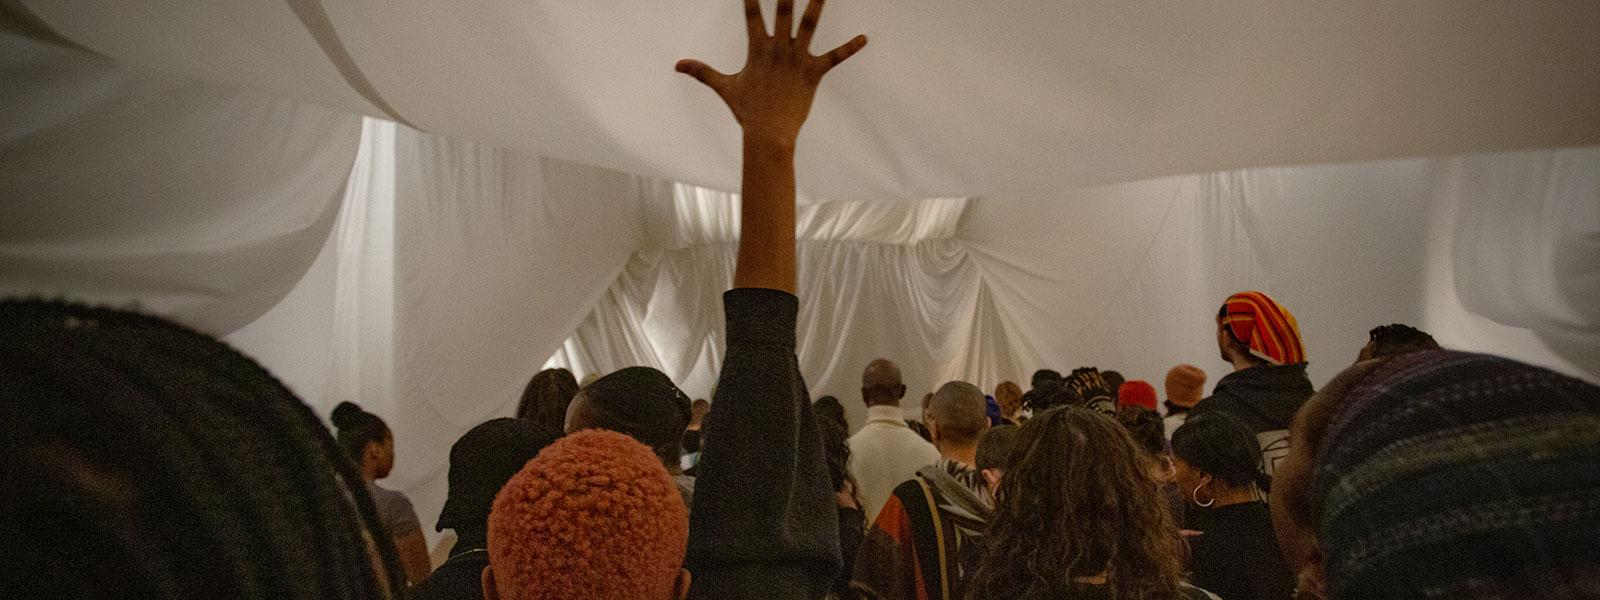 "Okwui Okpokwasili in ""Sitting on a Man's Head,"" Danspace Project, February 2020. Photo: Tony Turnerto: Tony Turner"